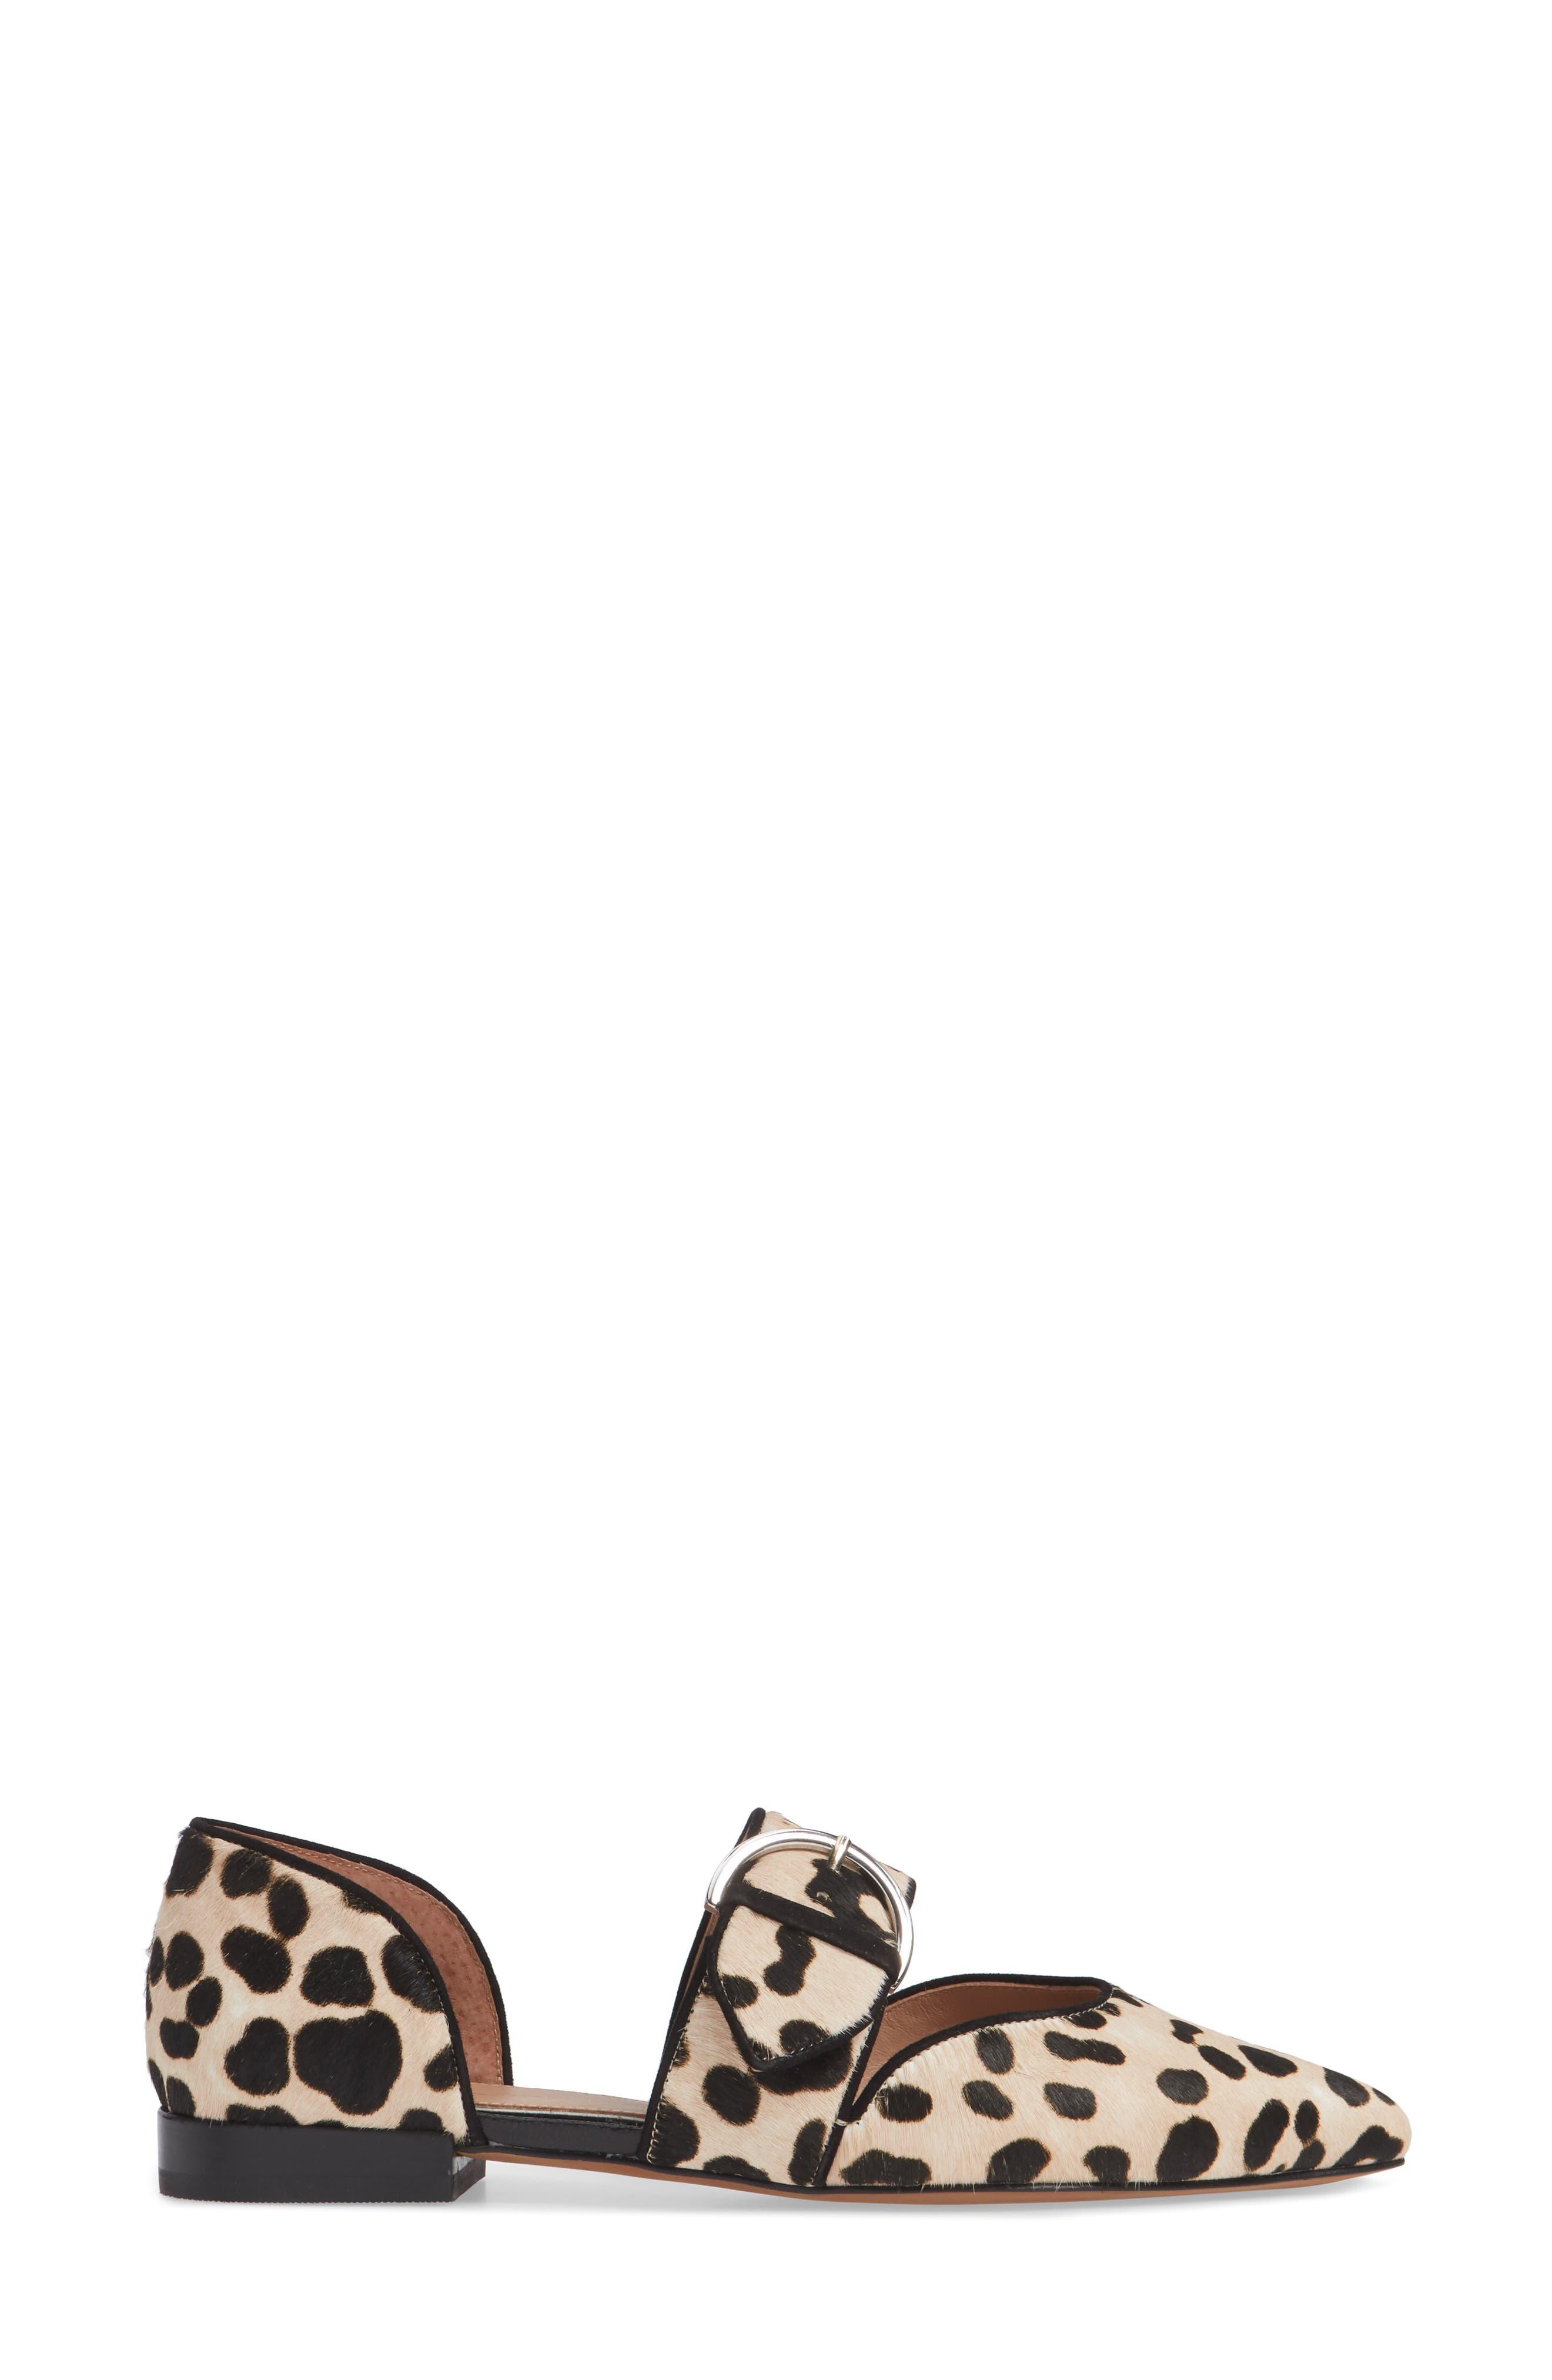 LINEA PAOLO, Dean Pointy Toe Flat, Alternate thumbnail 3, color, WHITE/ BLACK PRINT HAIRCALF